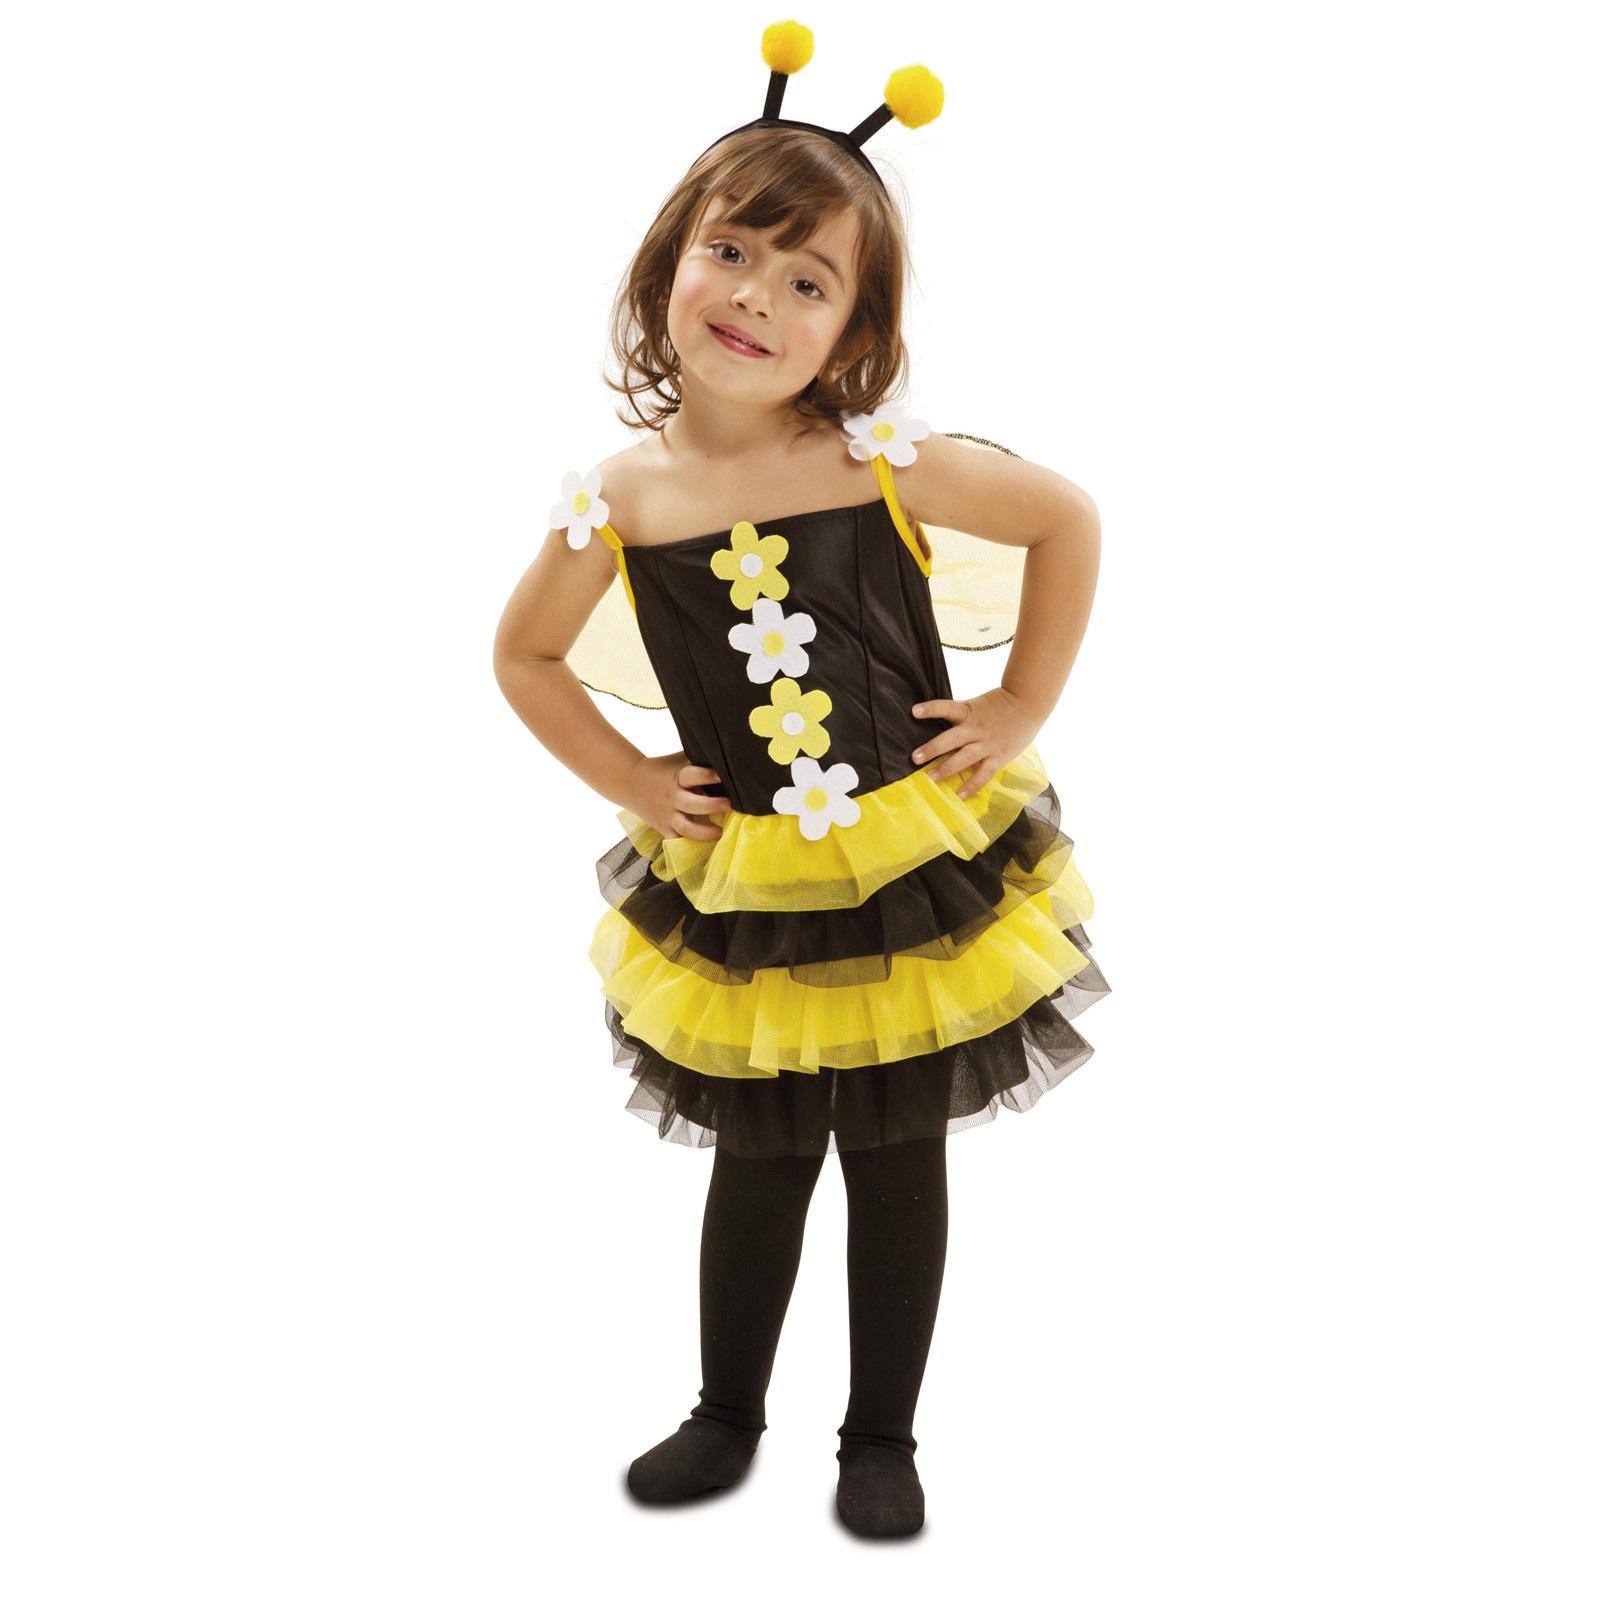 disfraz pequeña abejita 202288mom - DISFRAZ DE PEQUEÑA ABEJITA NIÑA